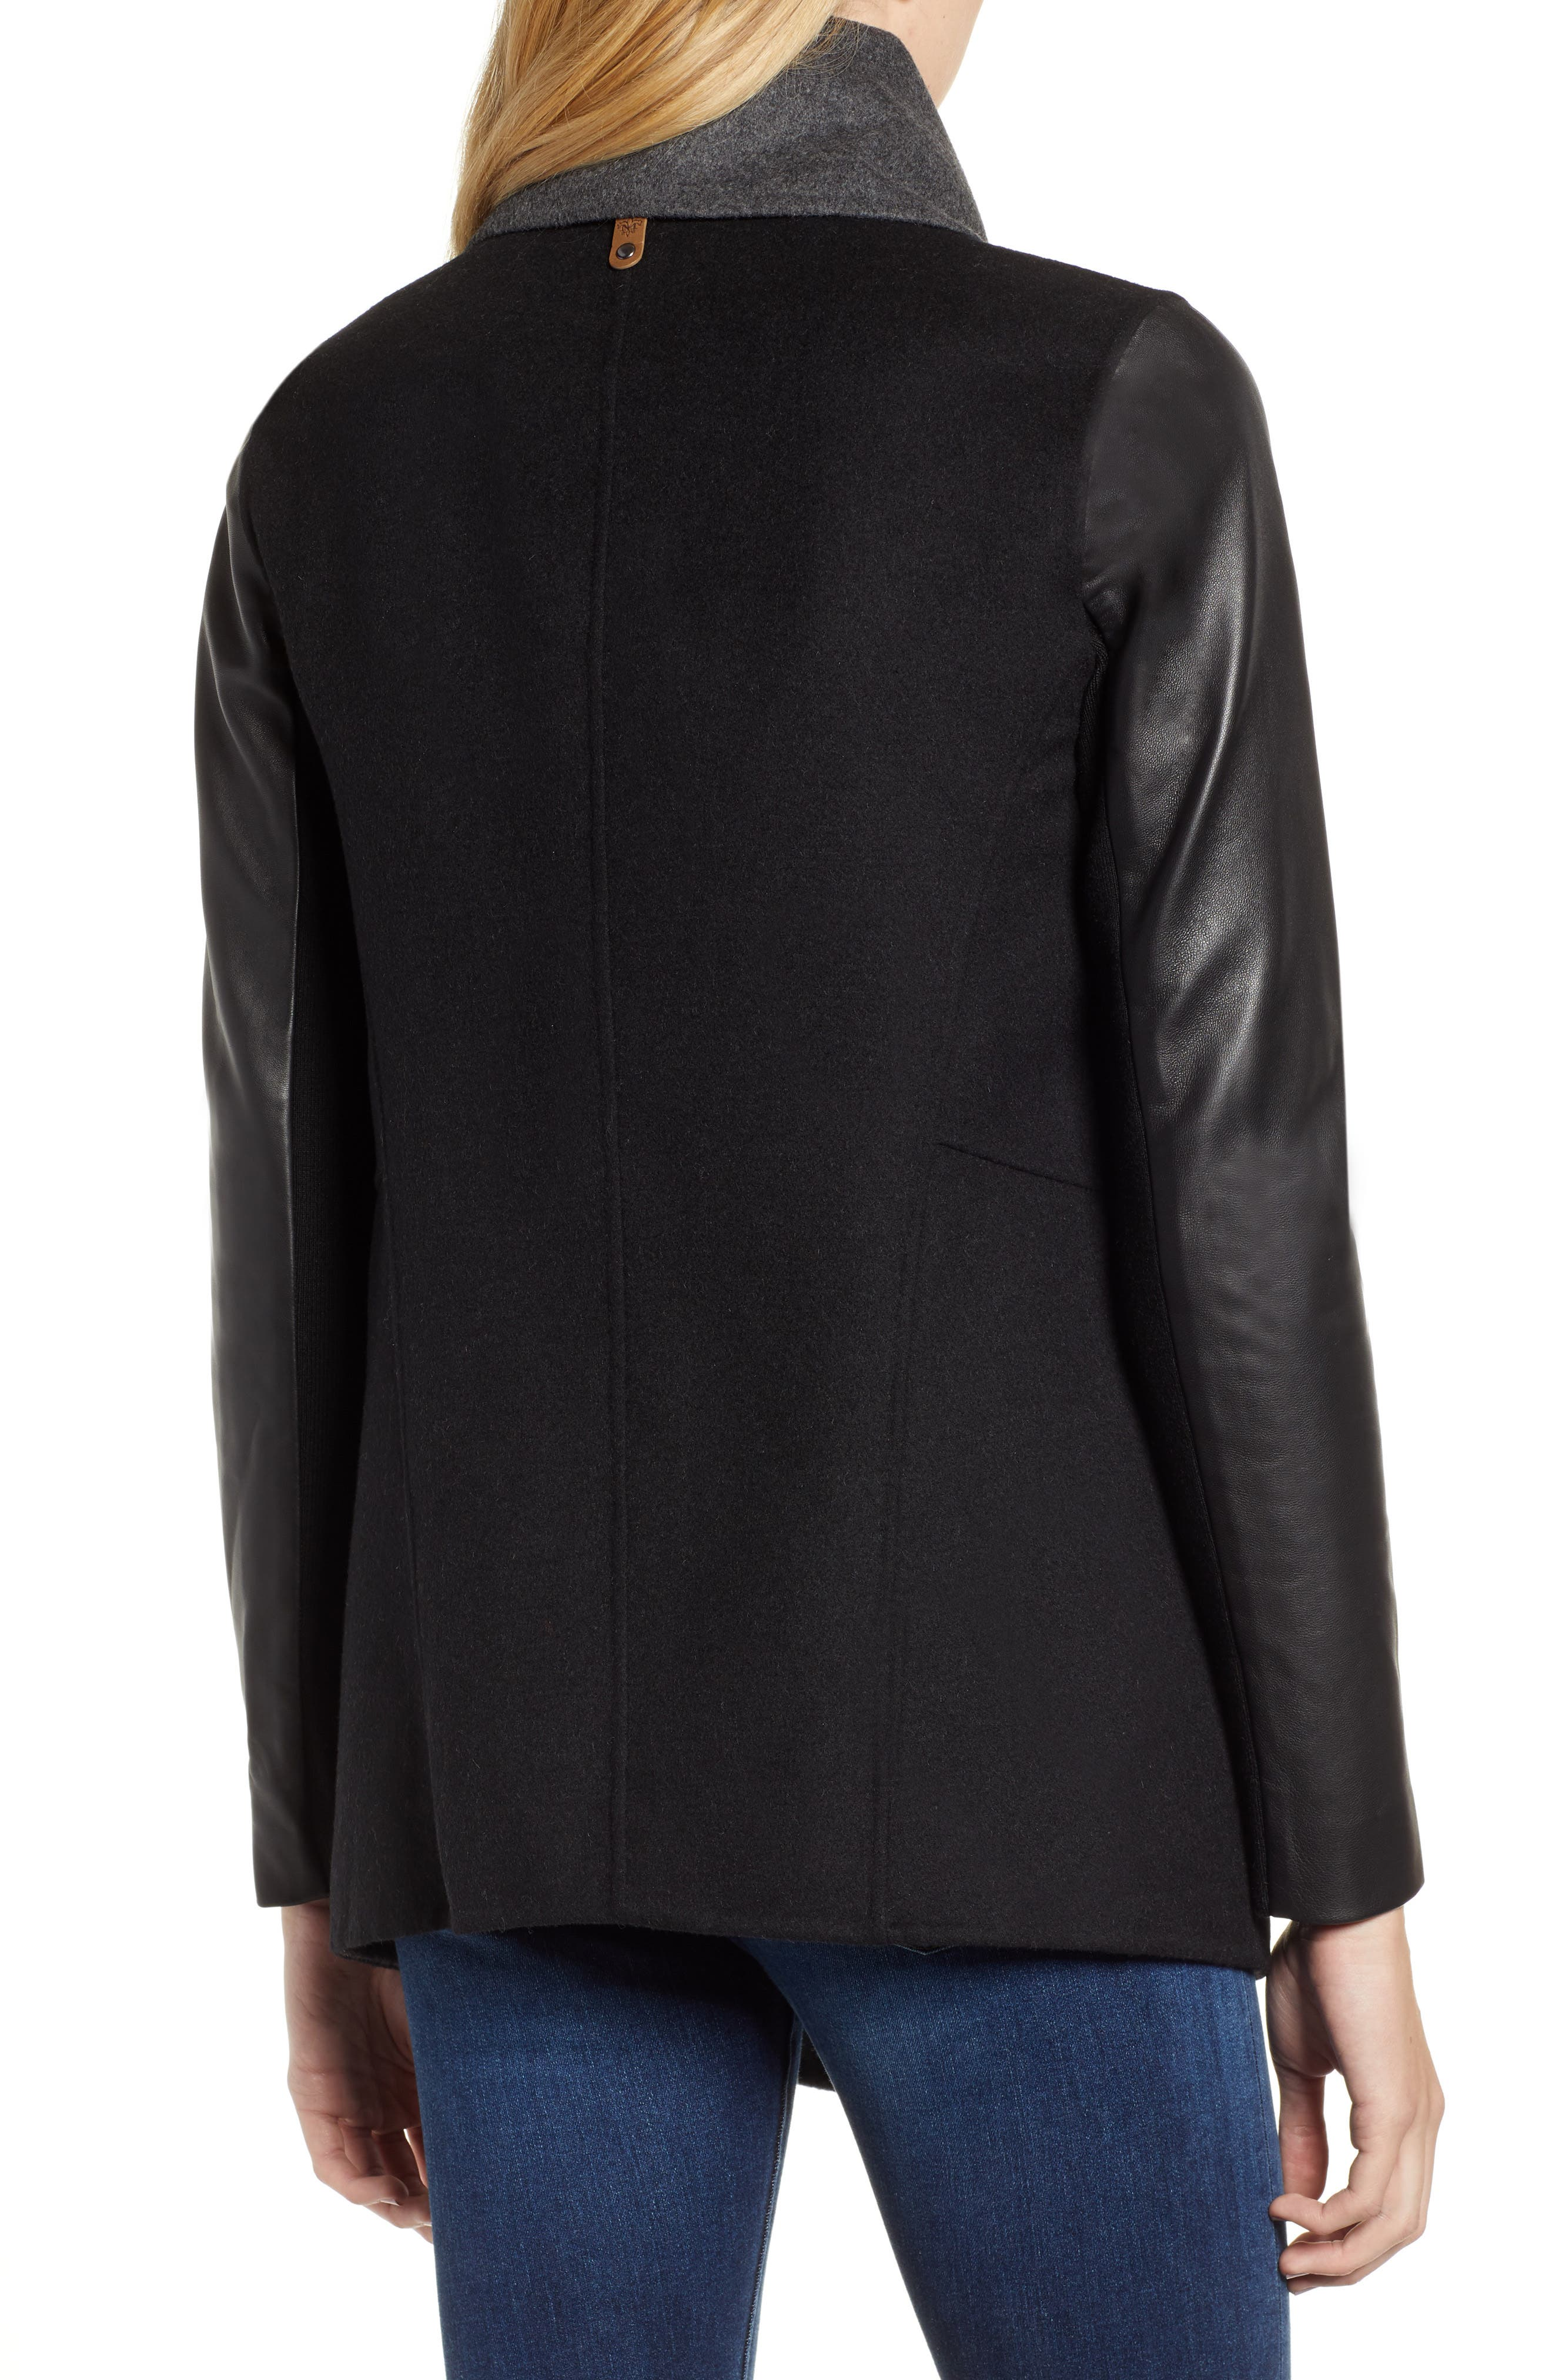 Vane Asymmetrical Leather Sleeve Coat,                             Alternate thumbnail 2, color,                             BLACK/ CHARCOAL